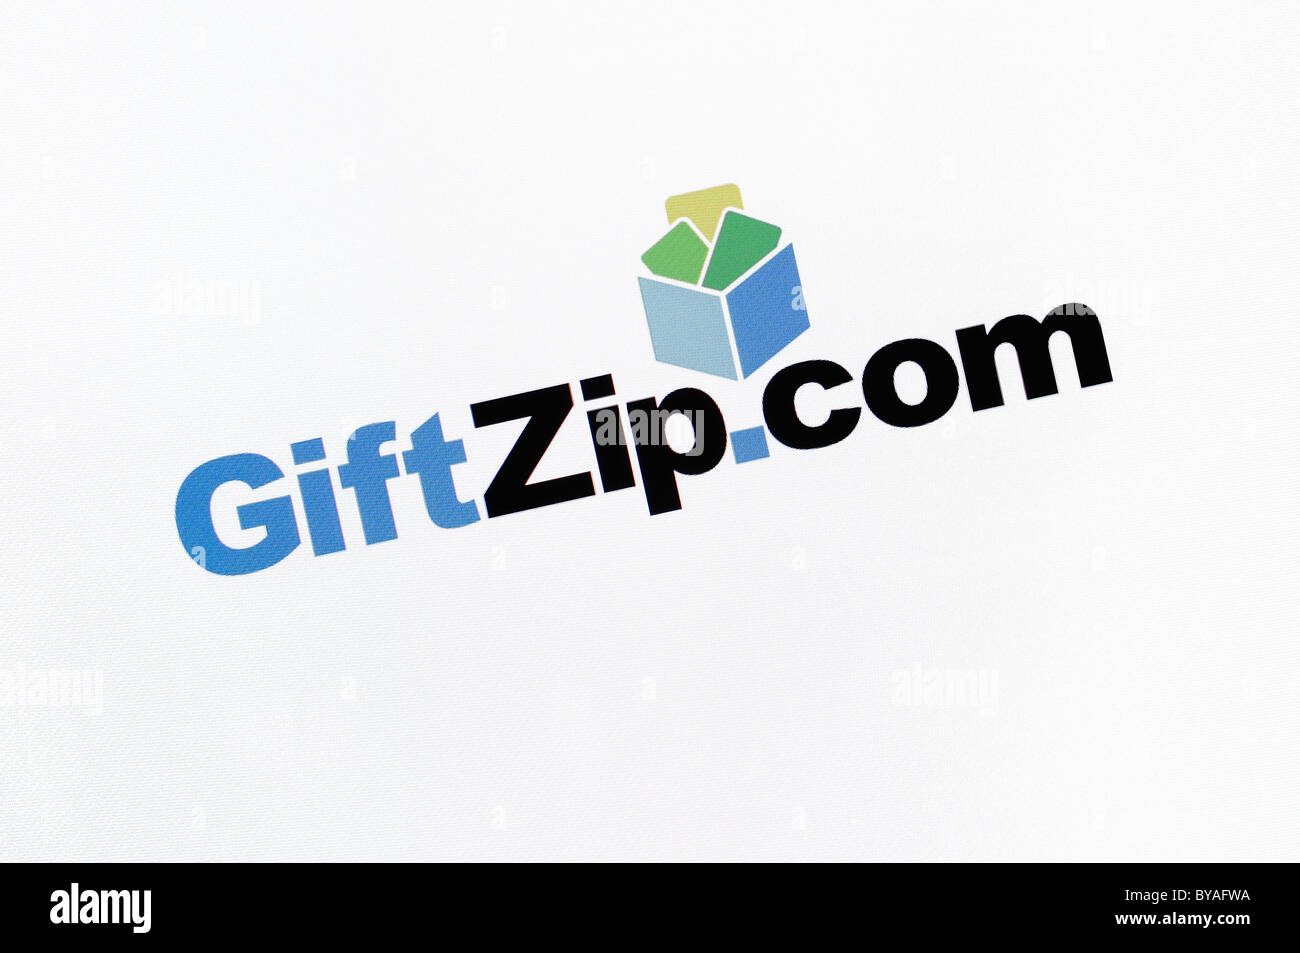 GiftZip.com Website Screenshot - Stock Image